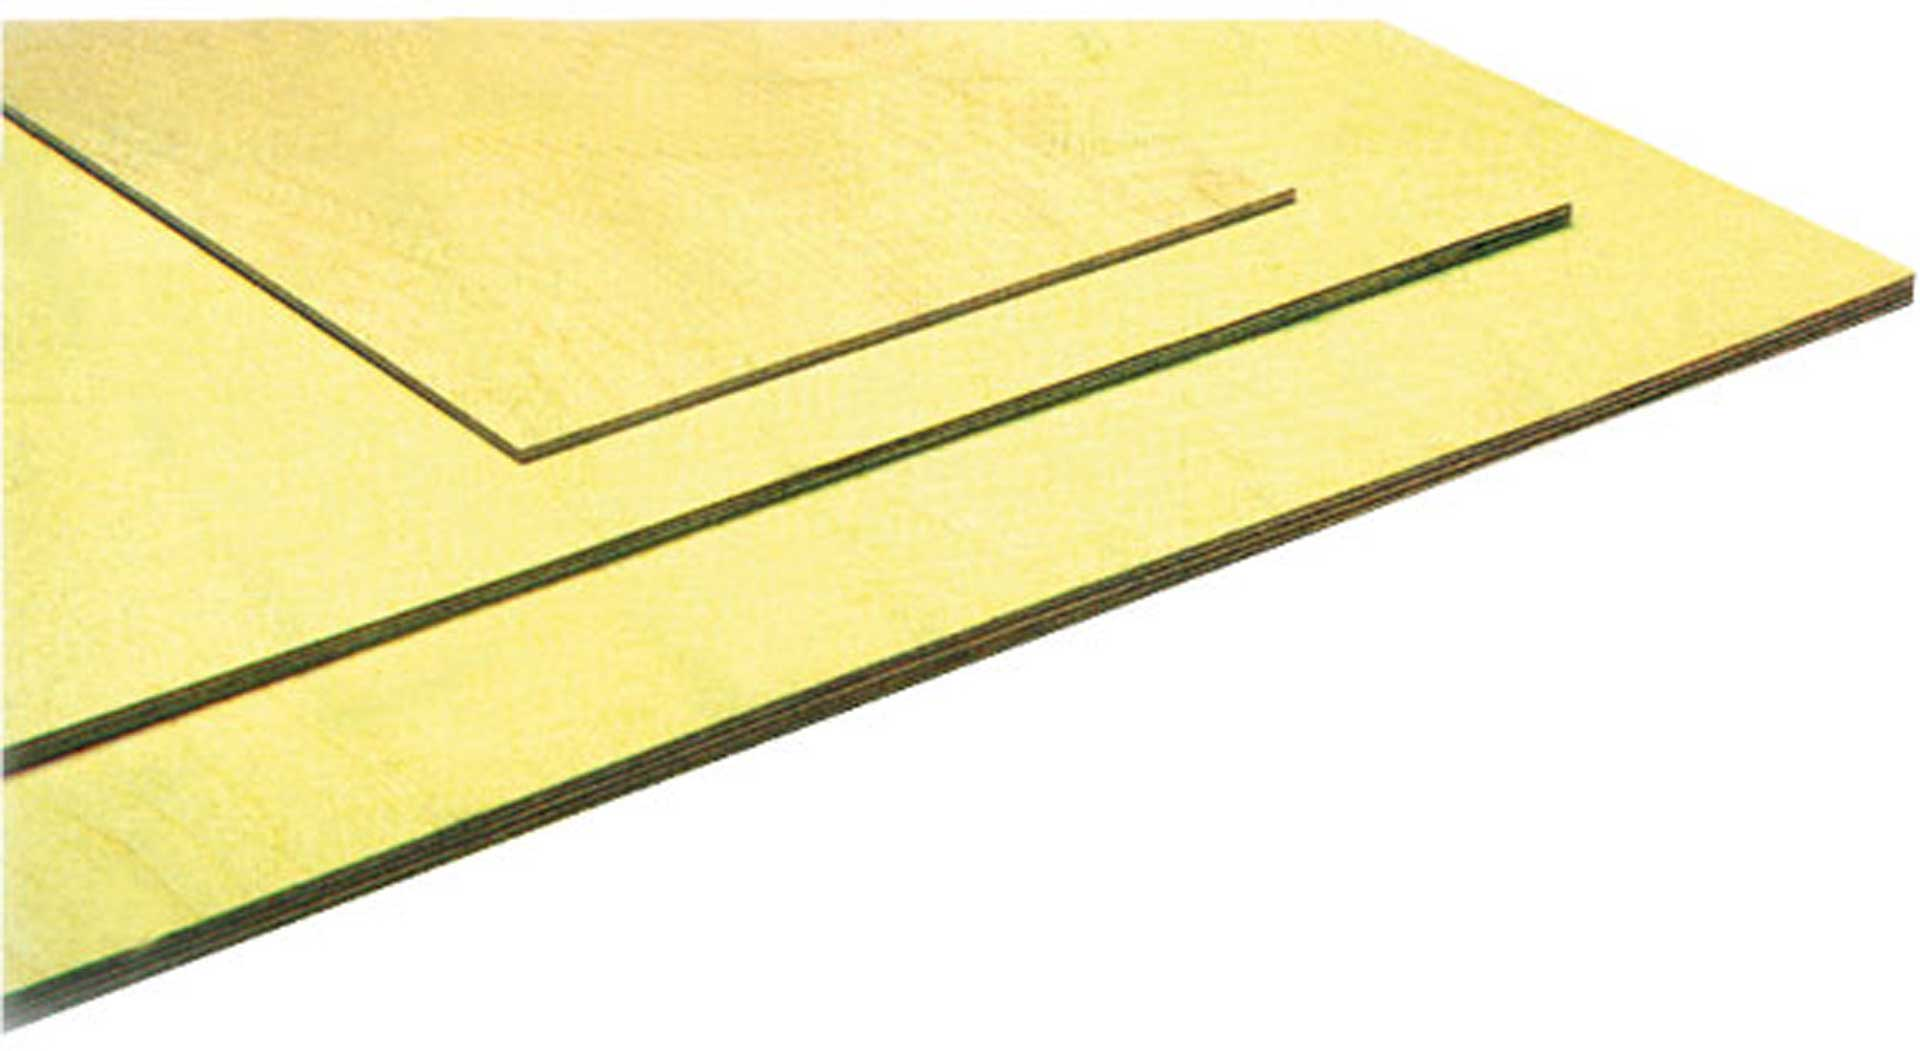 MODELLBAU LINDINGER BIRCH-SPERRY 0,8/300/1000MM